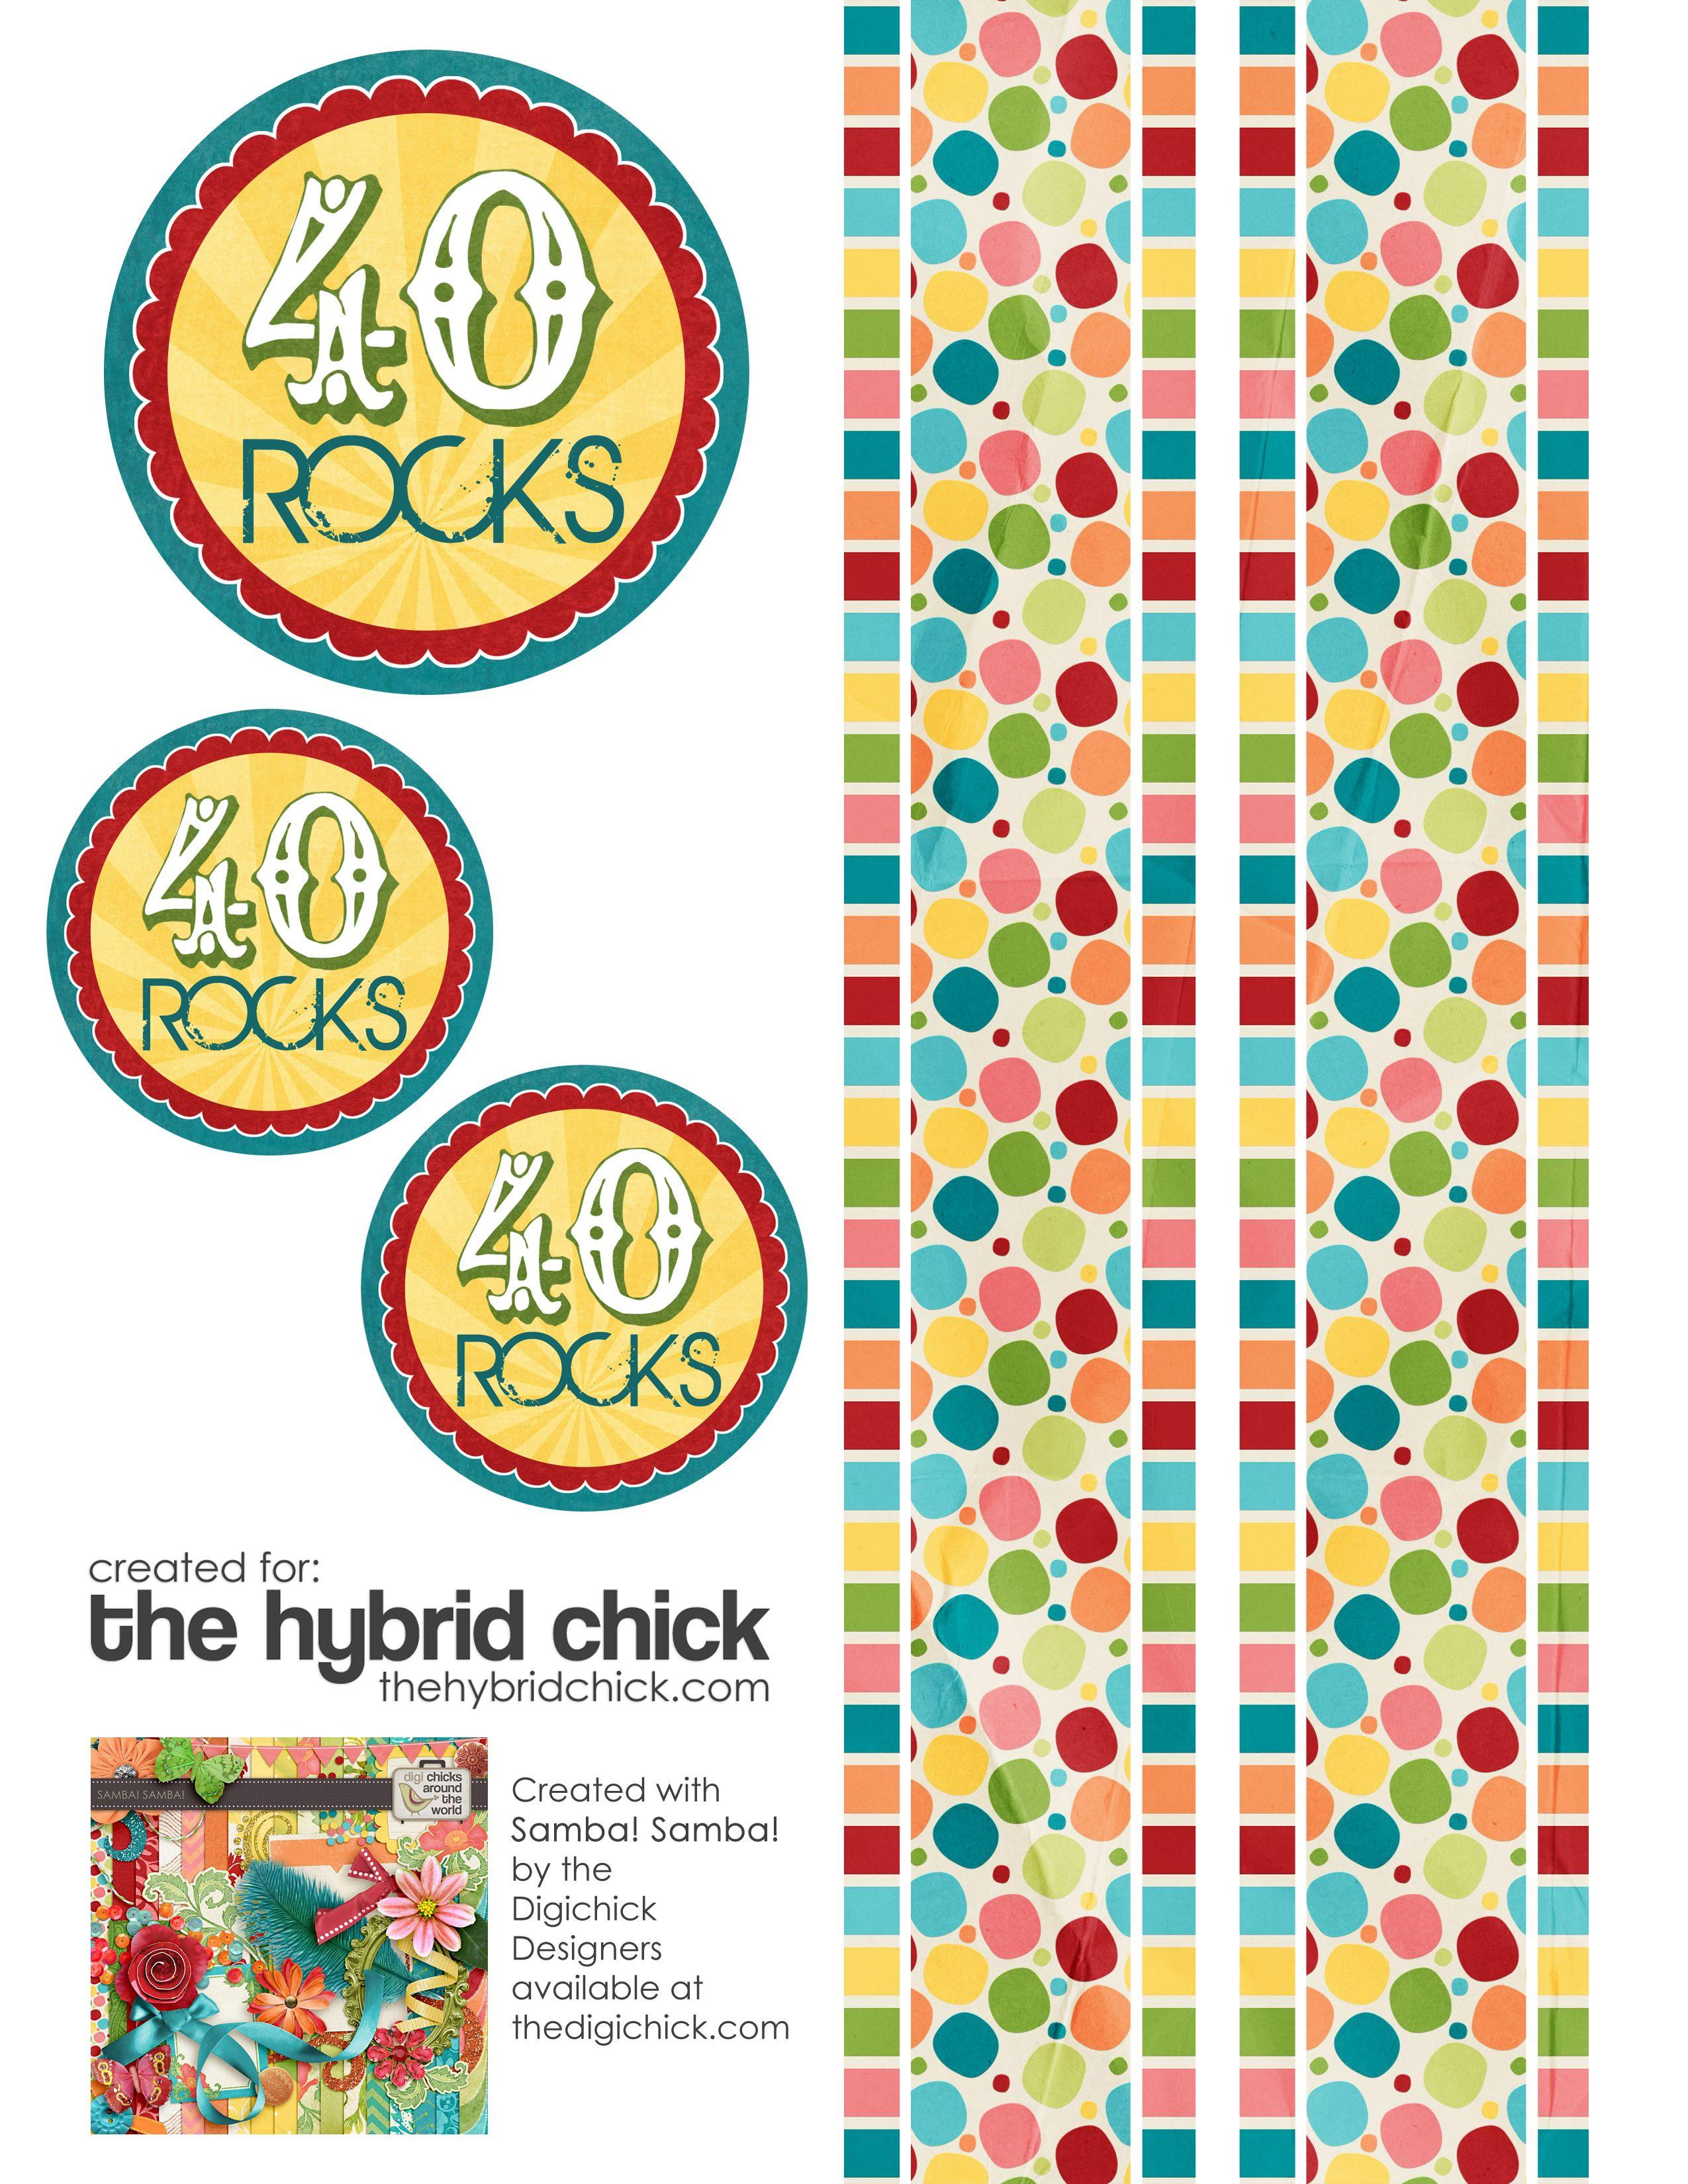 40 Rocks Birthday Gift – with Free Printable